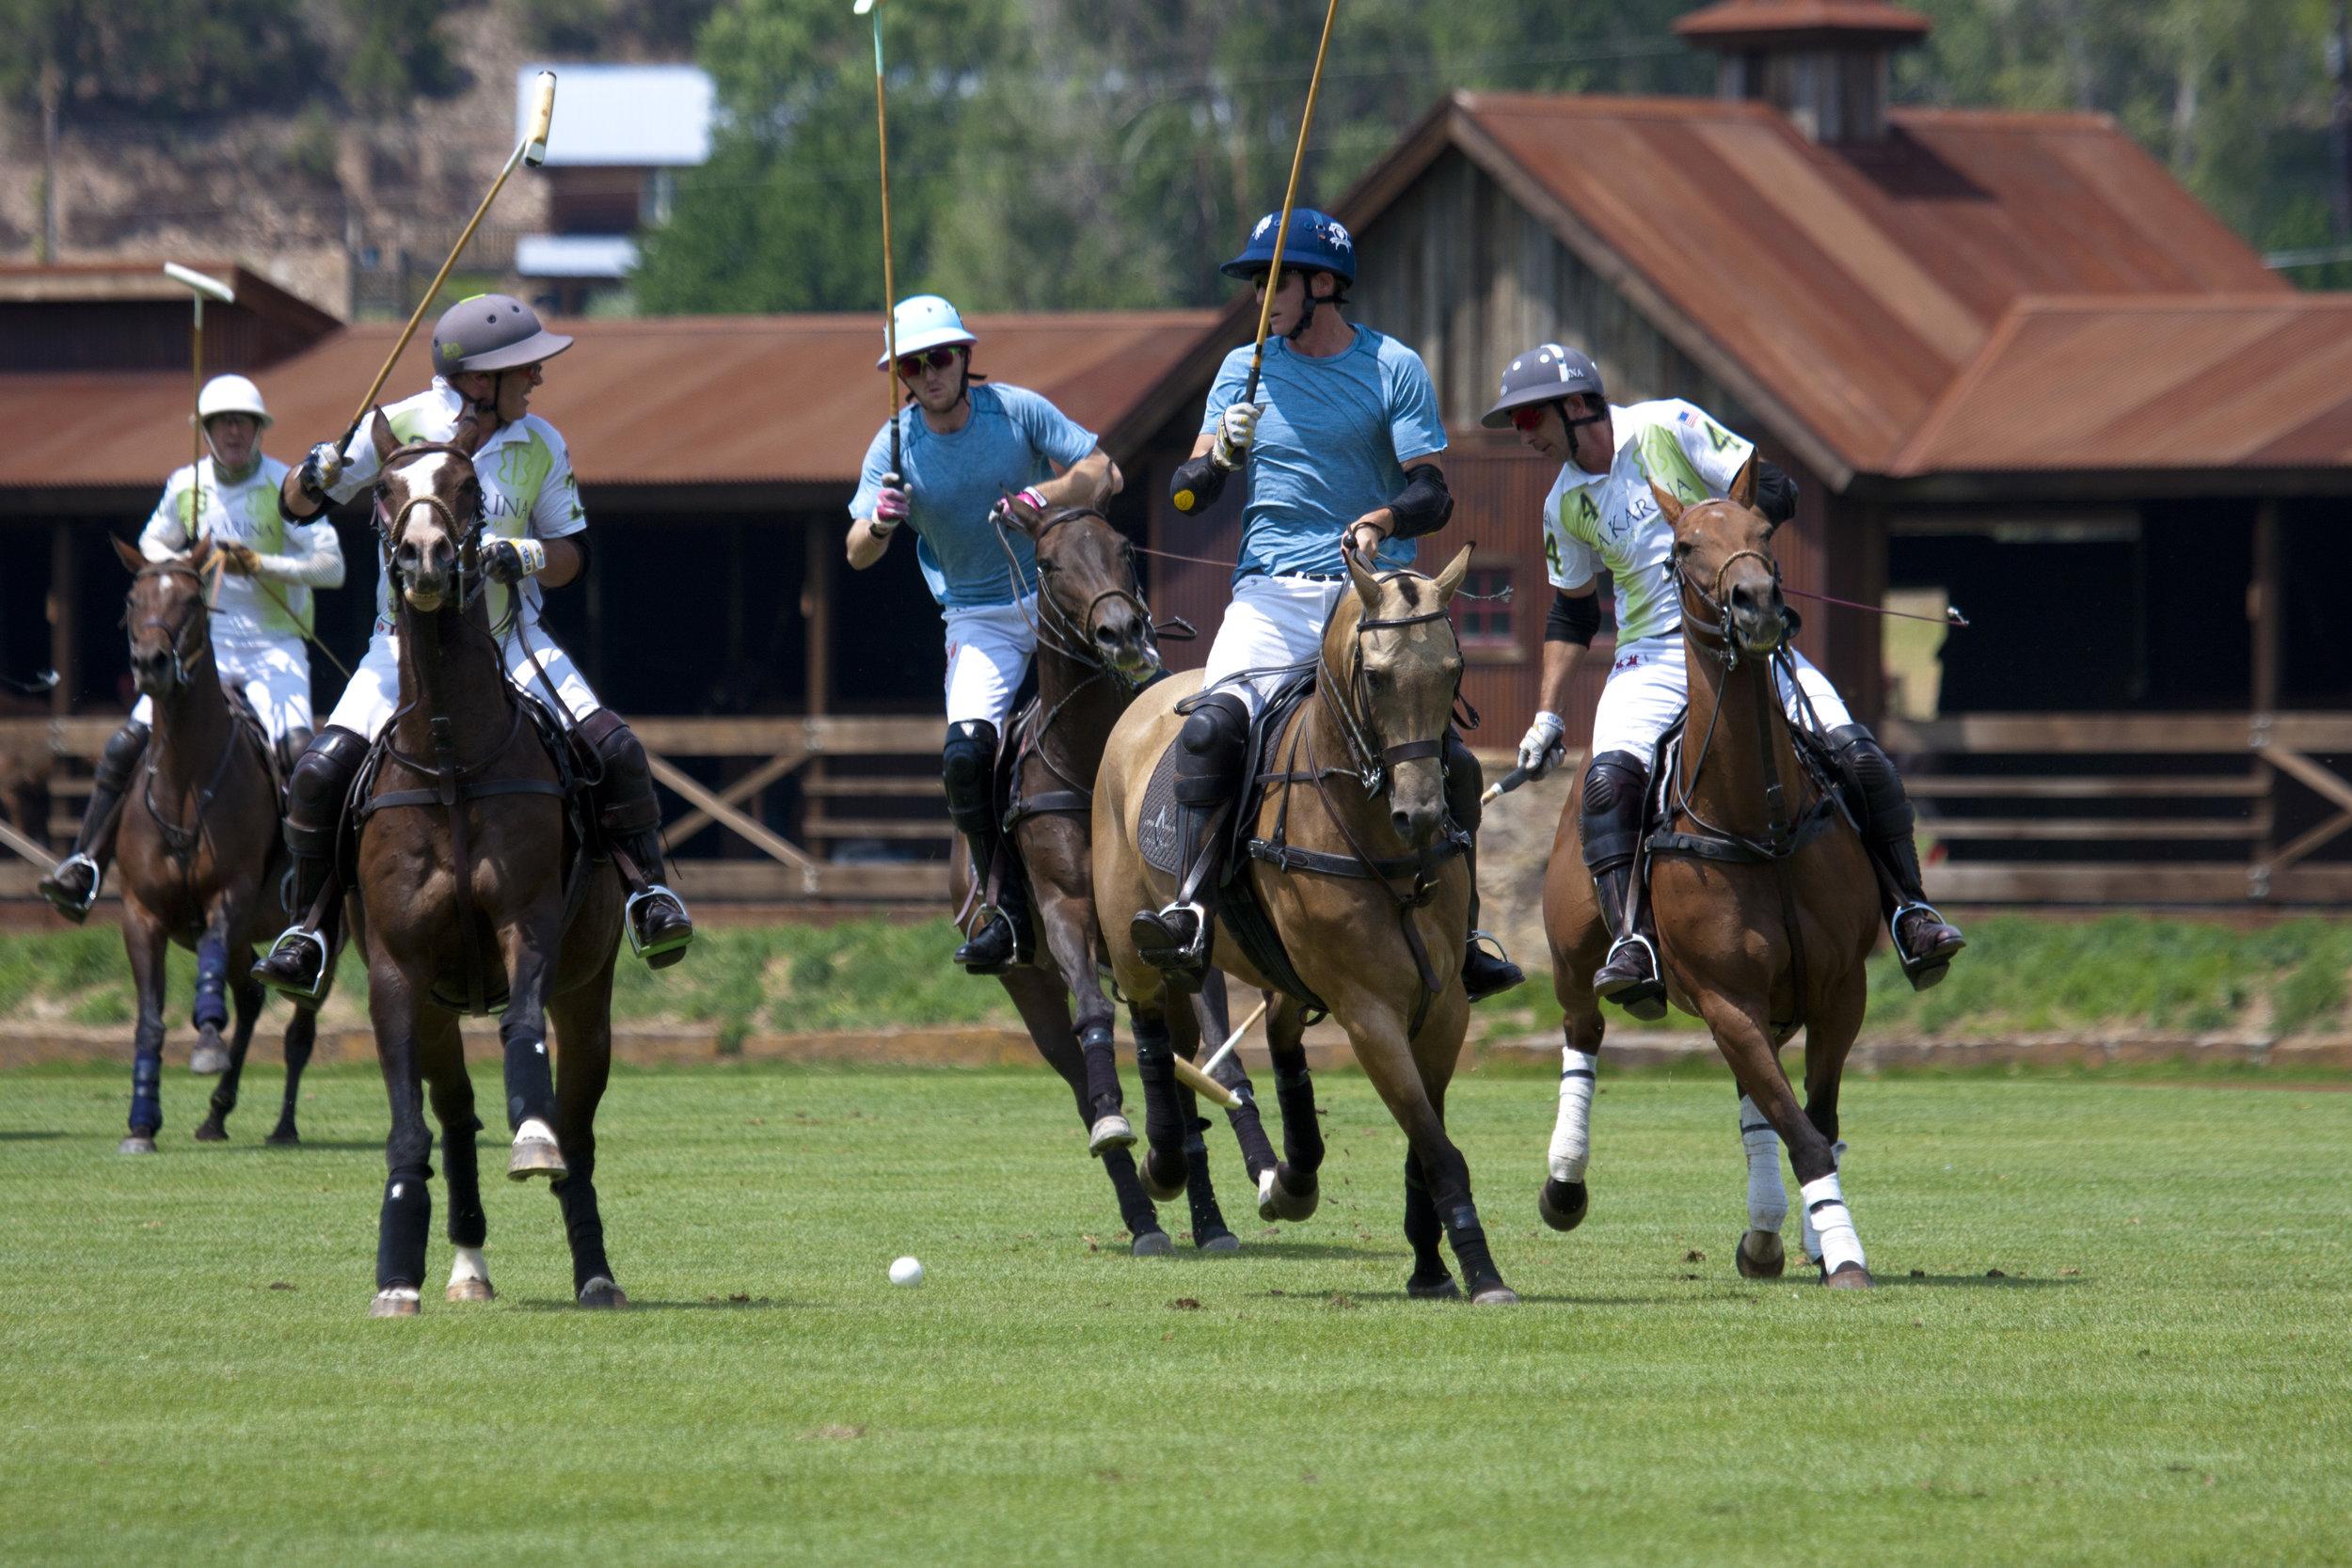 Grant Ganzi of Piocho Ranch passes the ball to.JPG